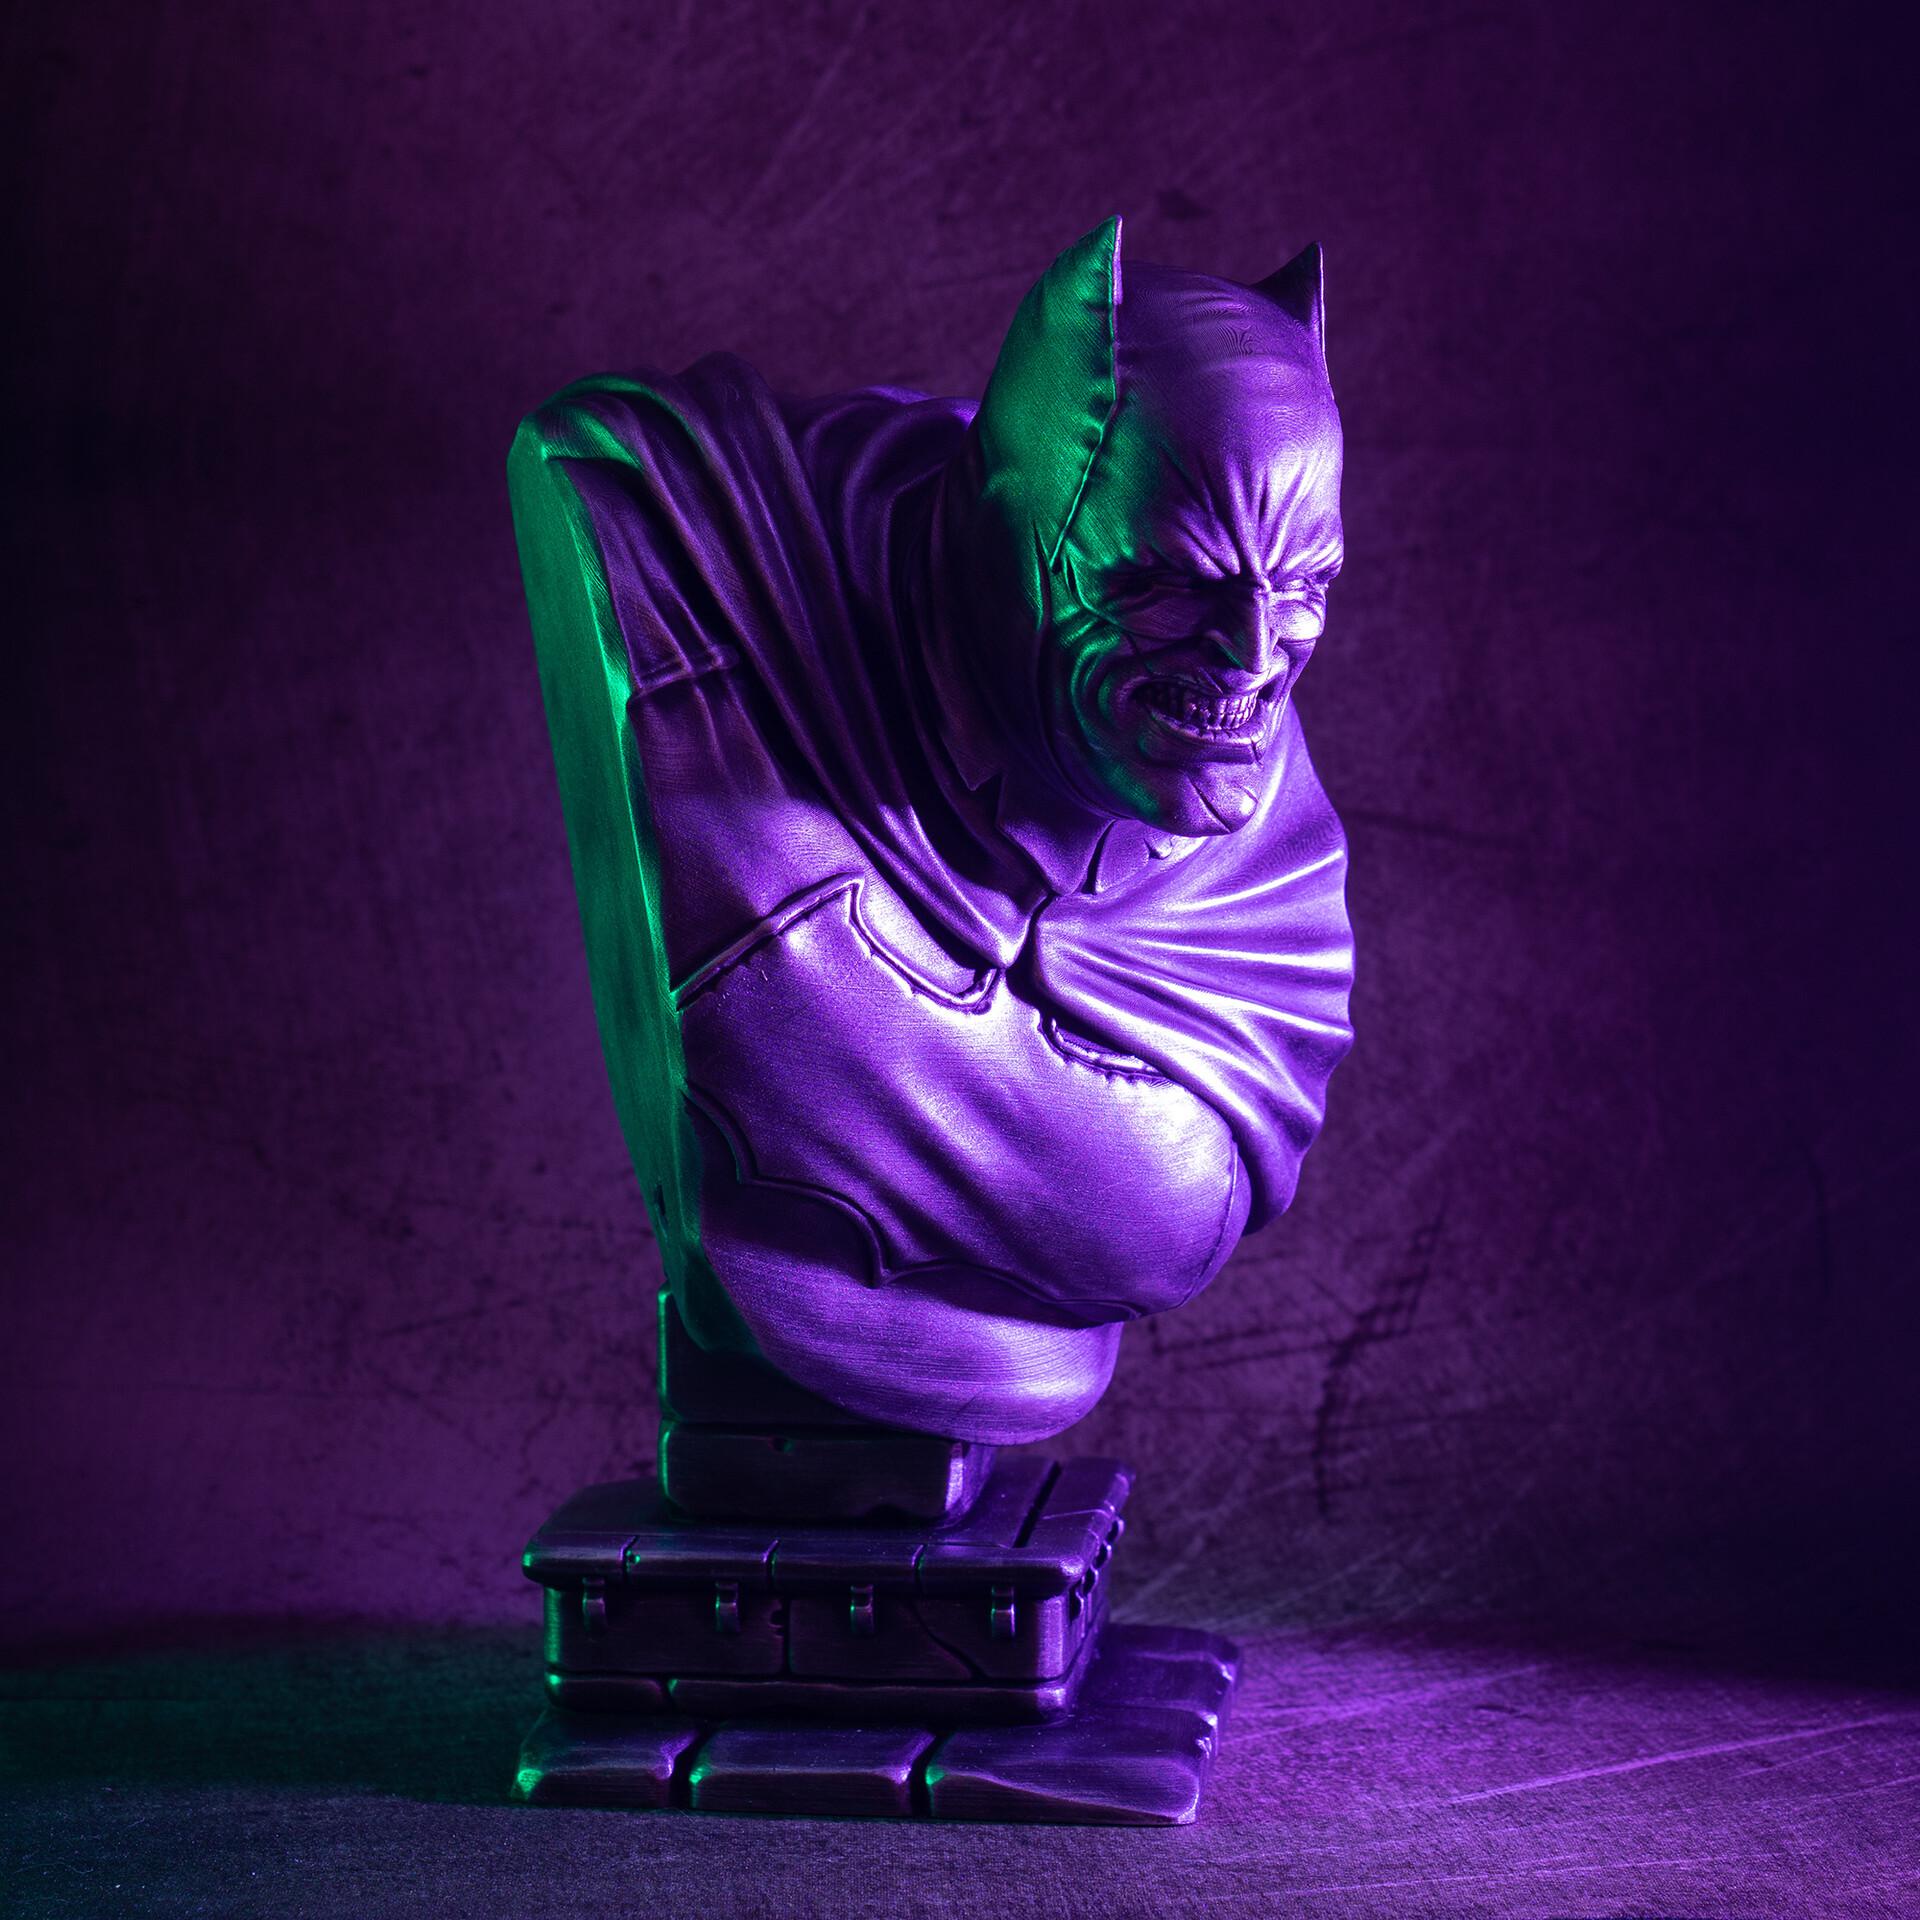 David ostman batman4 joker